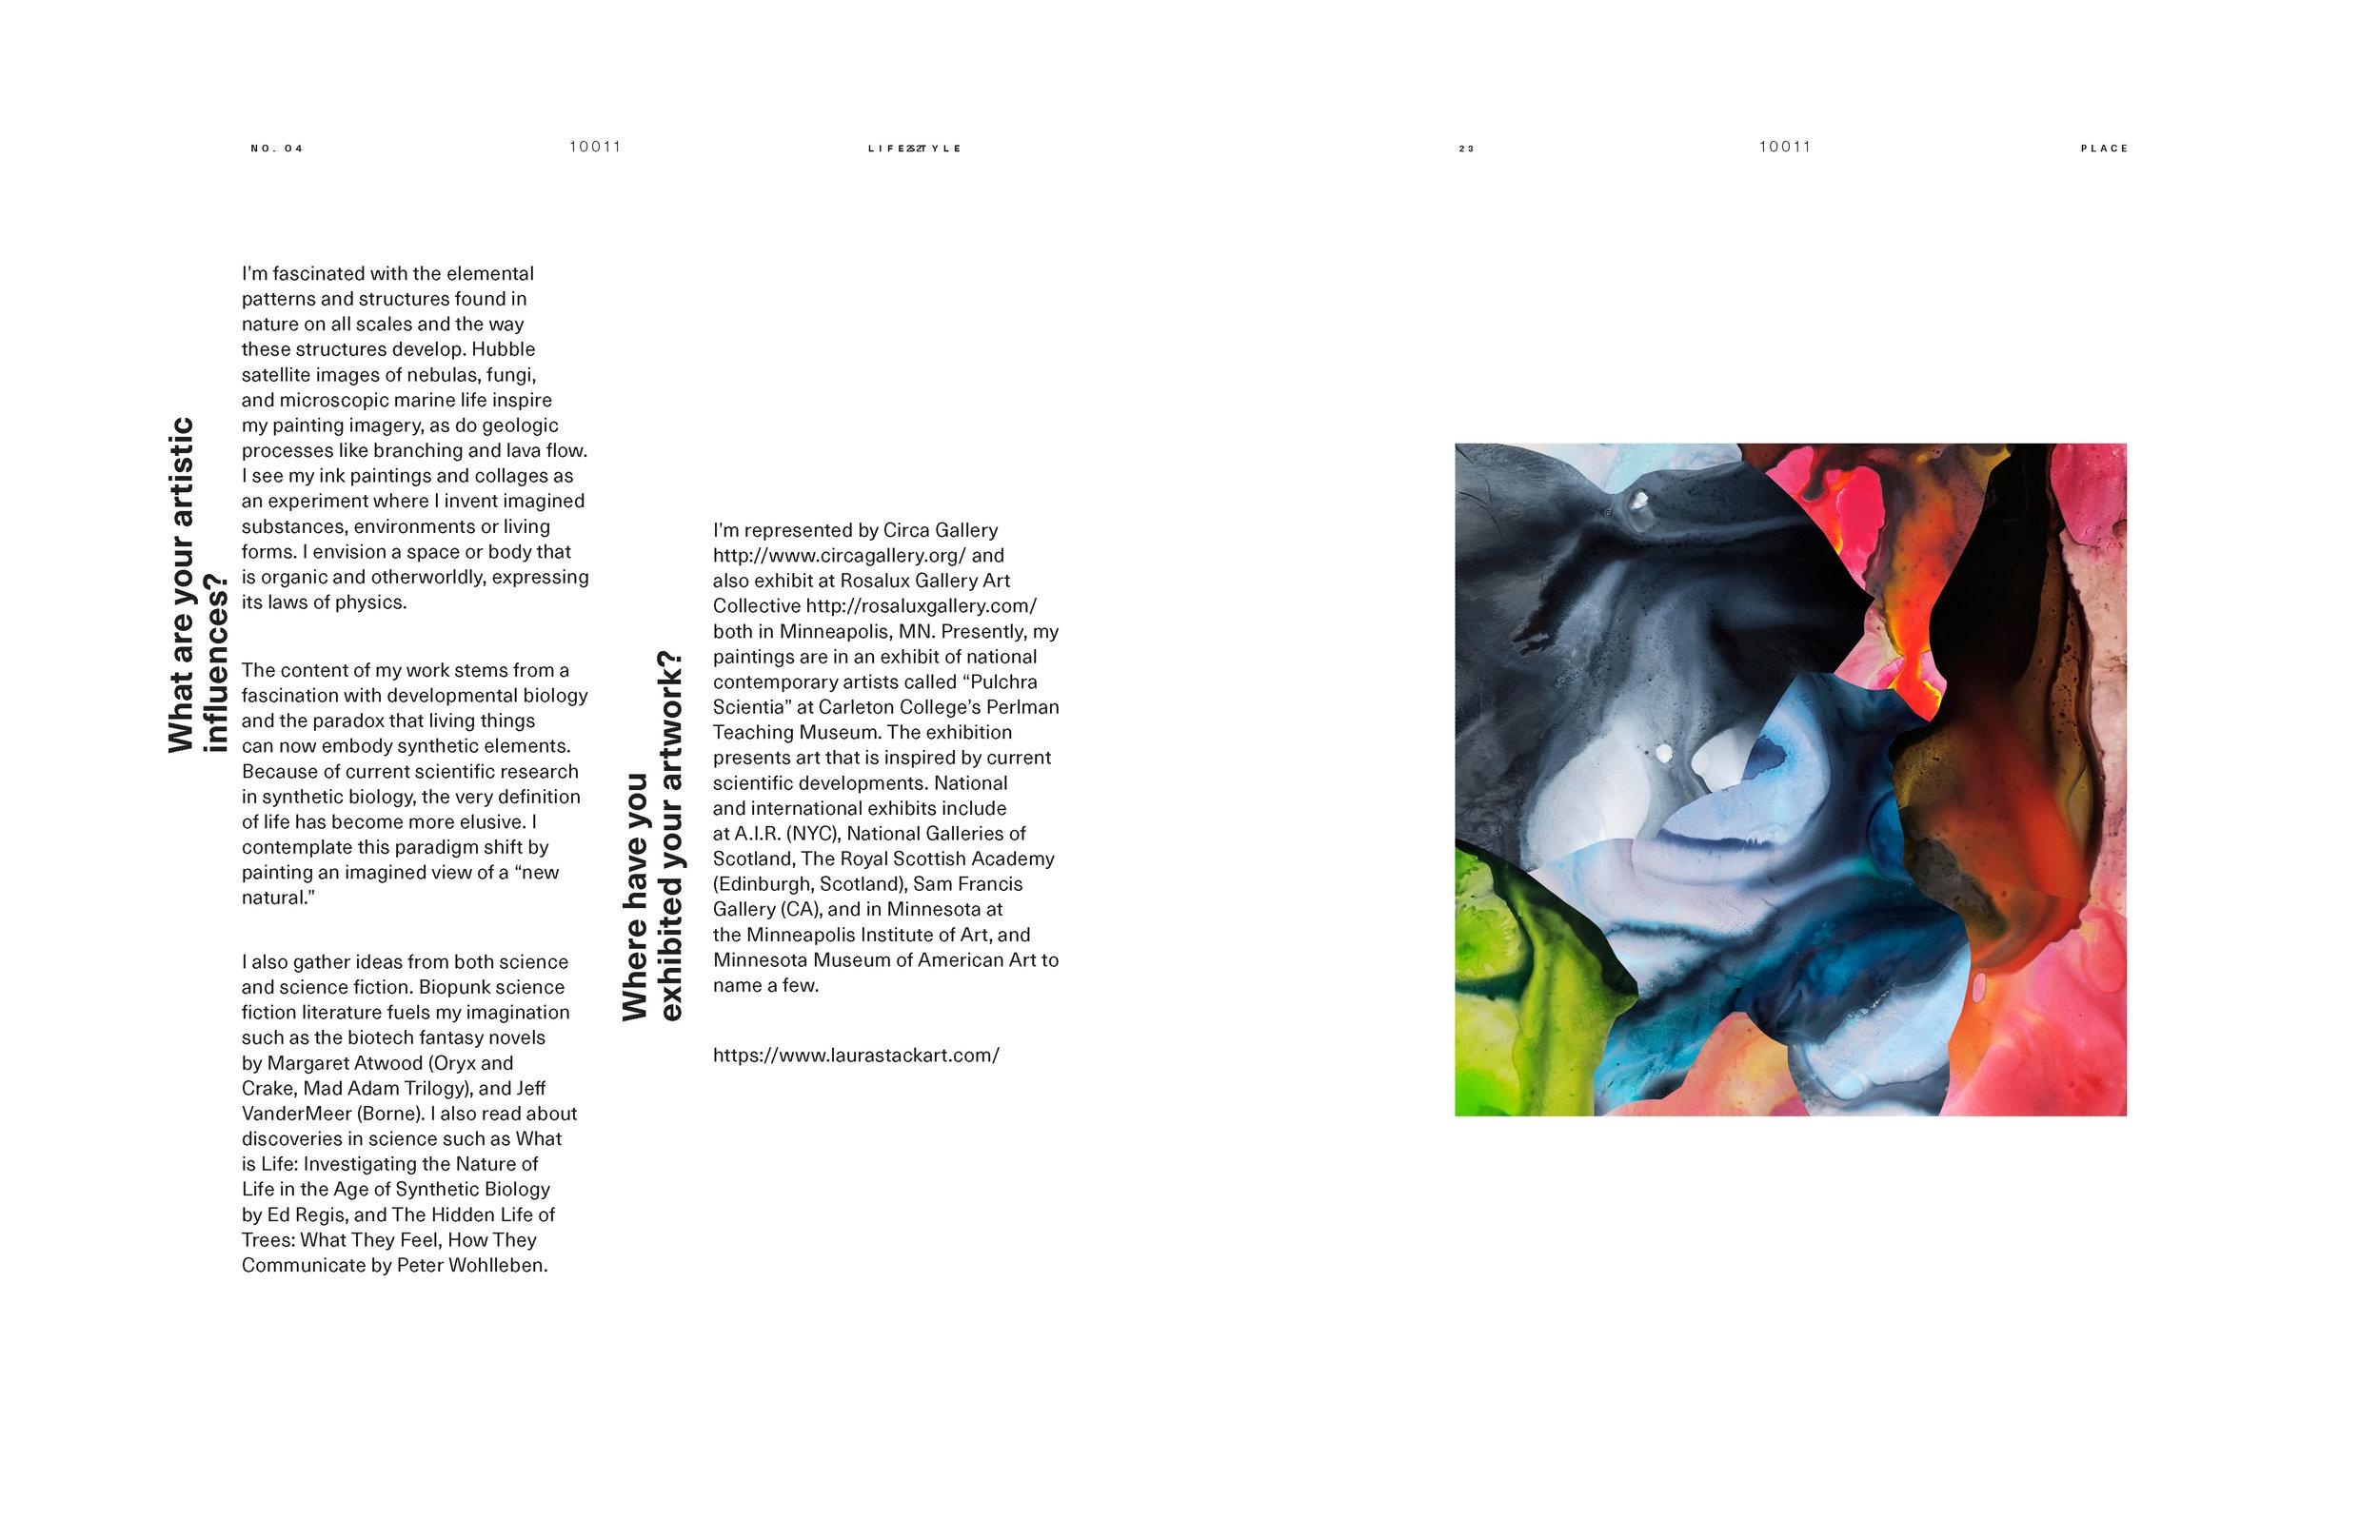 10011Mag-page 2.jpg